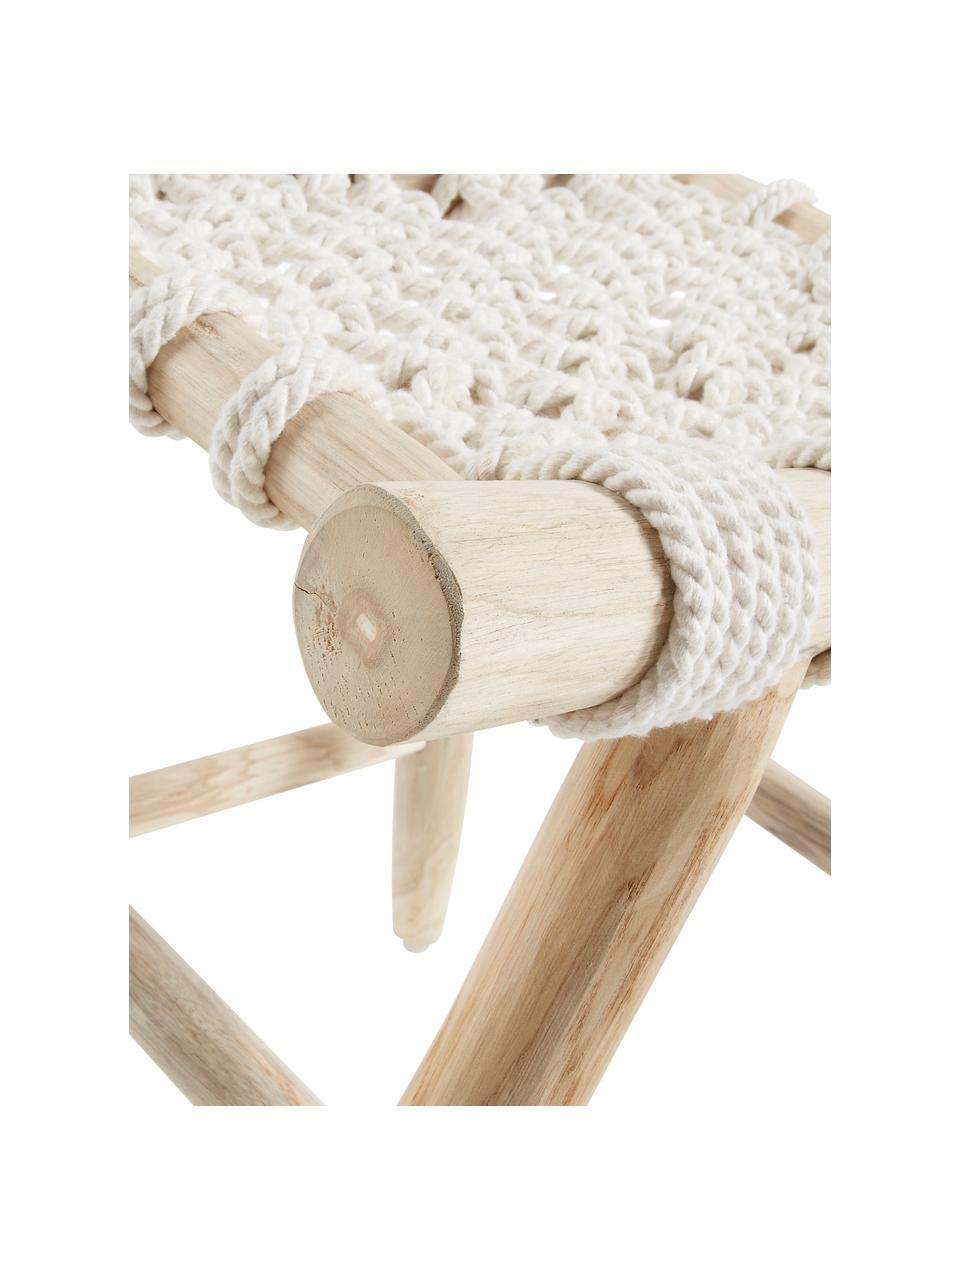 Sgabello in stile boho Edgard, Gambe: legno di teak naturale, Seduta: corda di cotone, Legno di teak, bianco, Larg. 45 x Alt. 45 cm